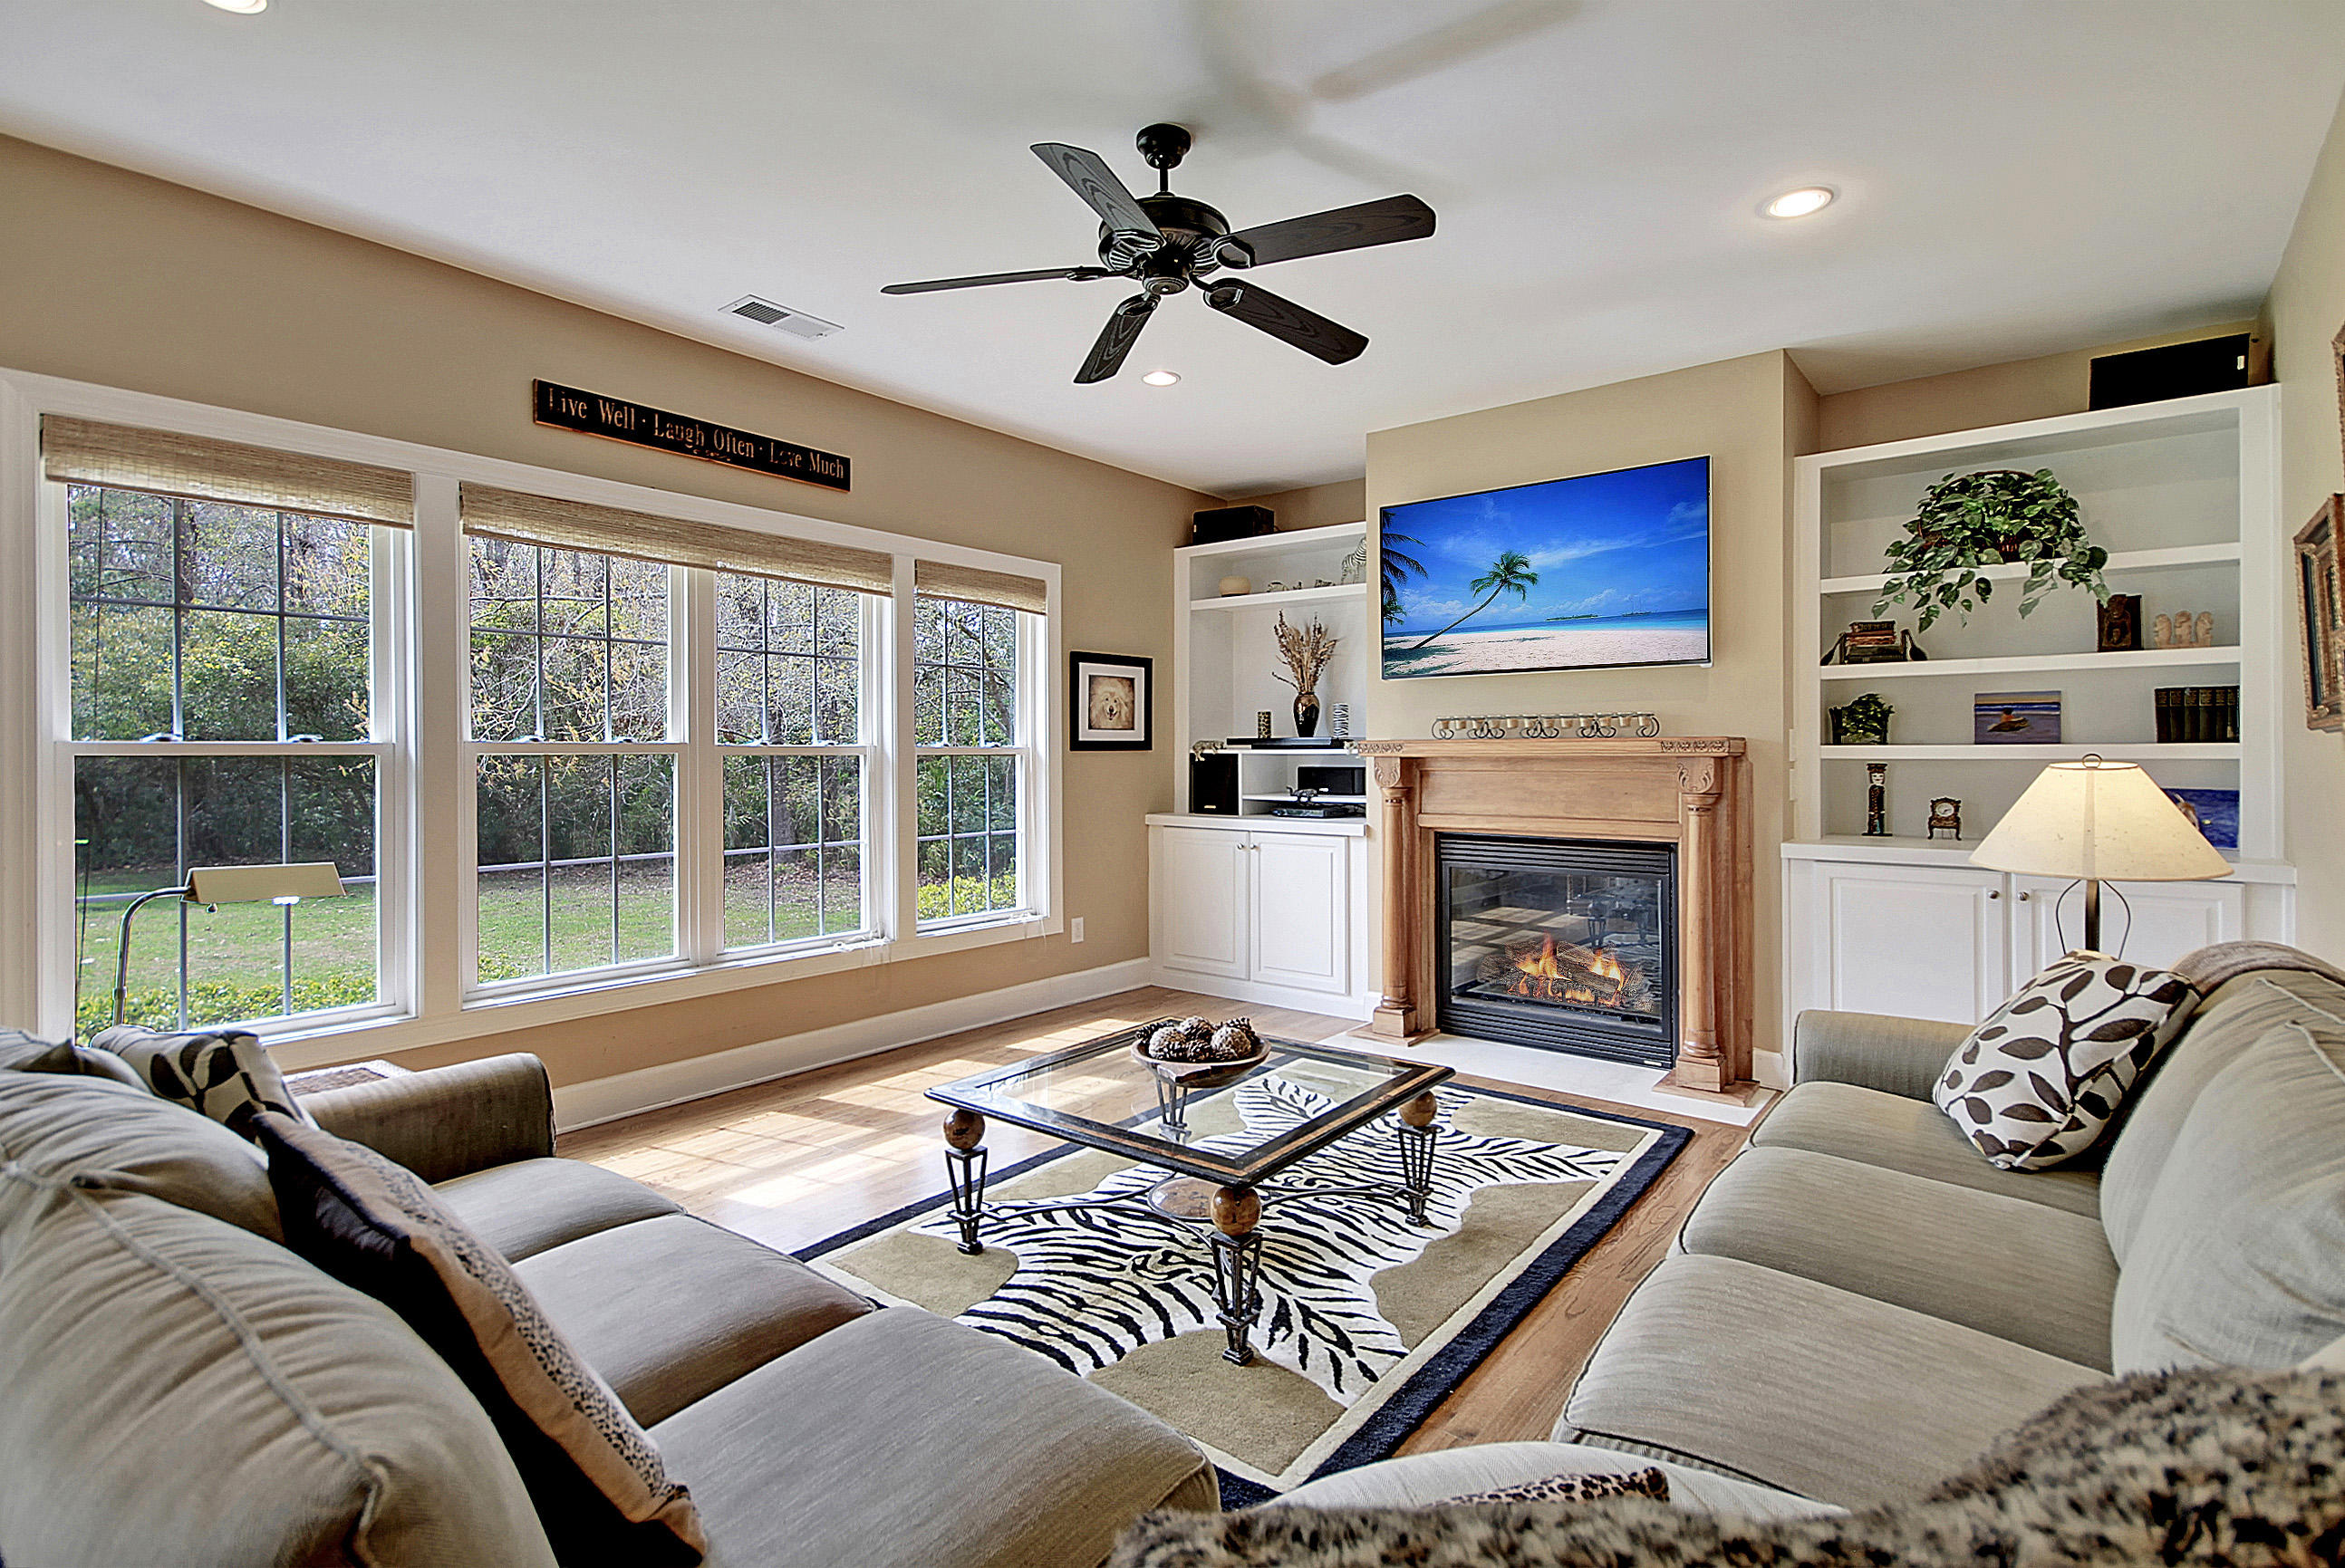 Dunes West Homes For Sale - 4002 Colonel Vanderhorst, Mount Pleasant, SC - 54